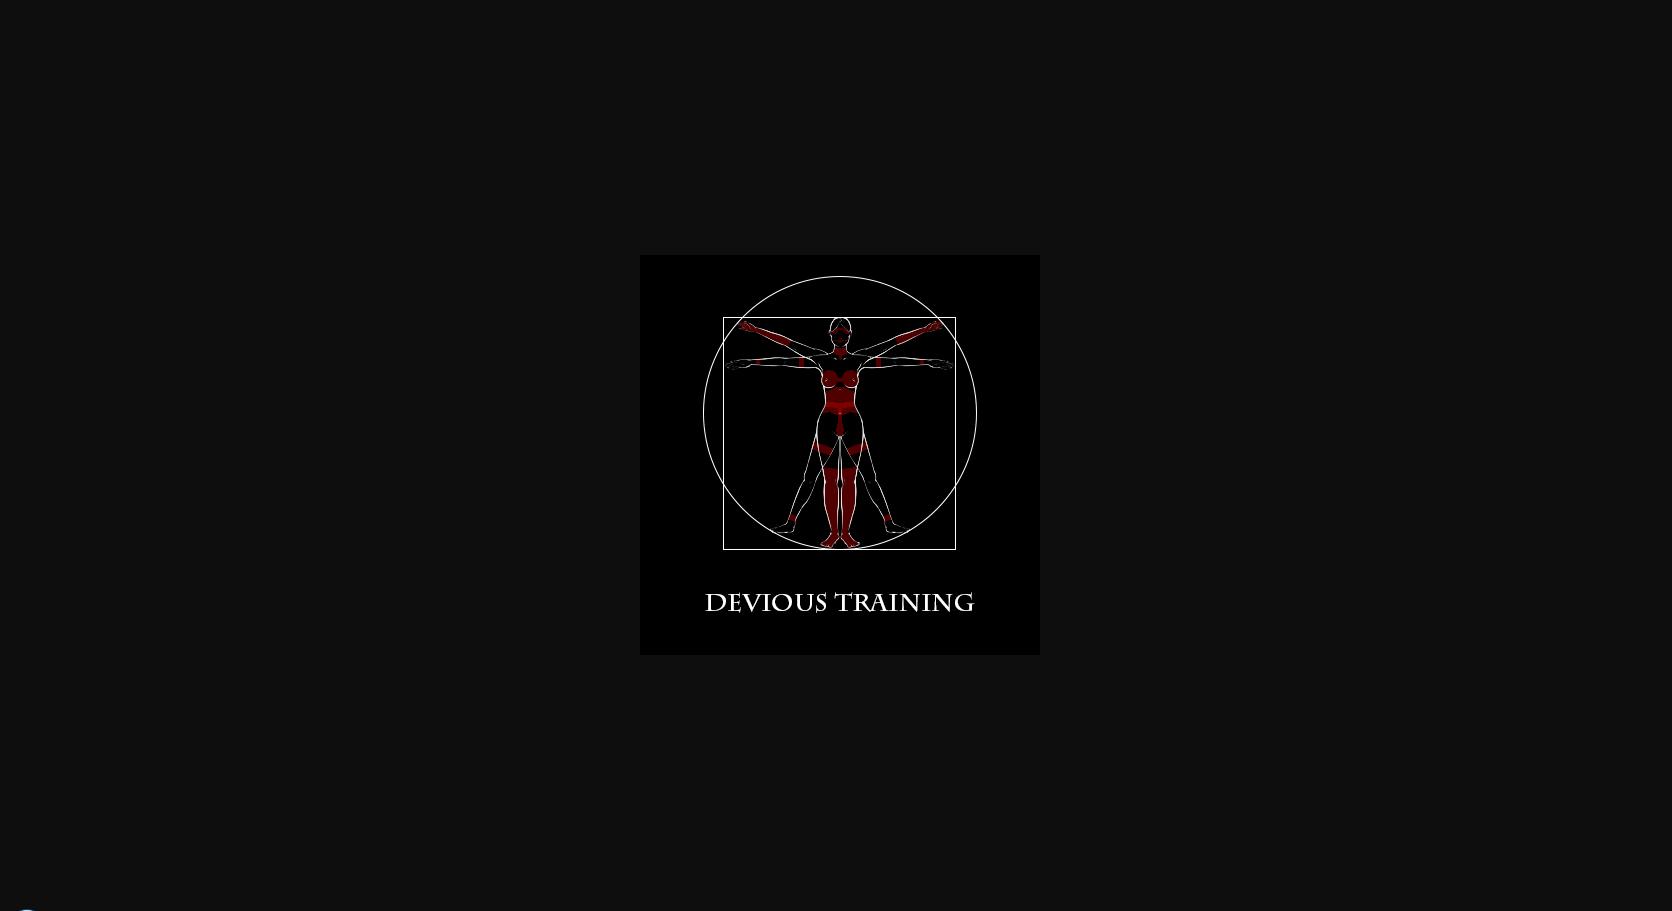 Devious Training1.2